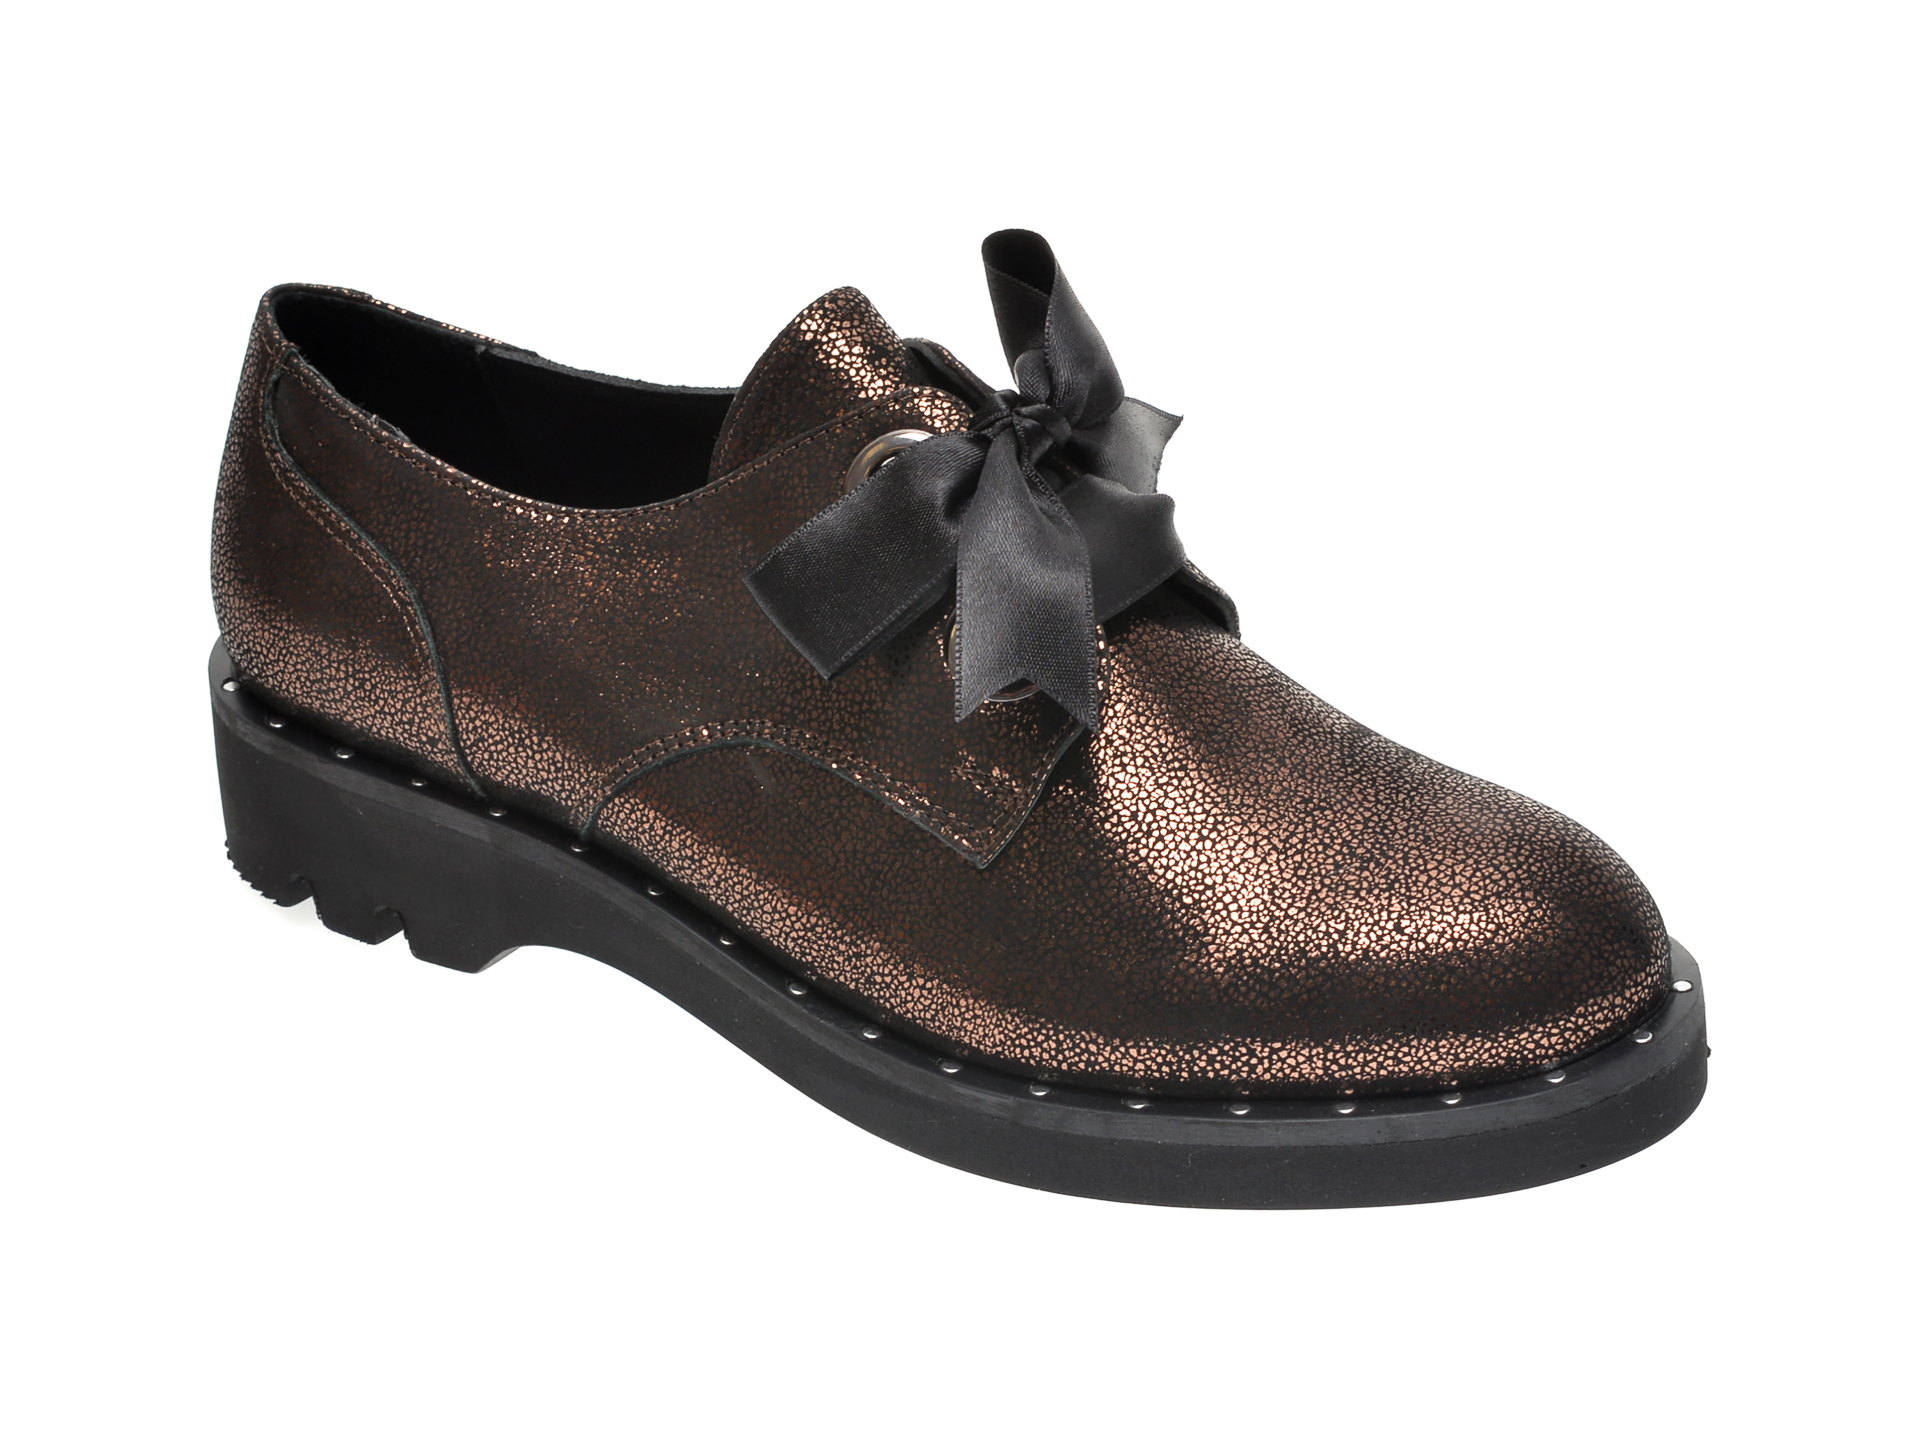 Pantofi ILOZ bronz, 107393, din piele naturala imagine